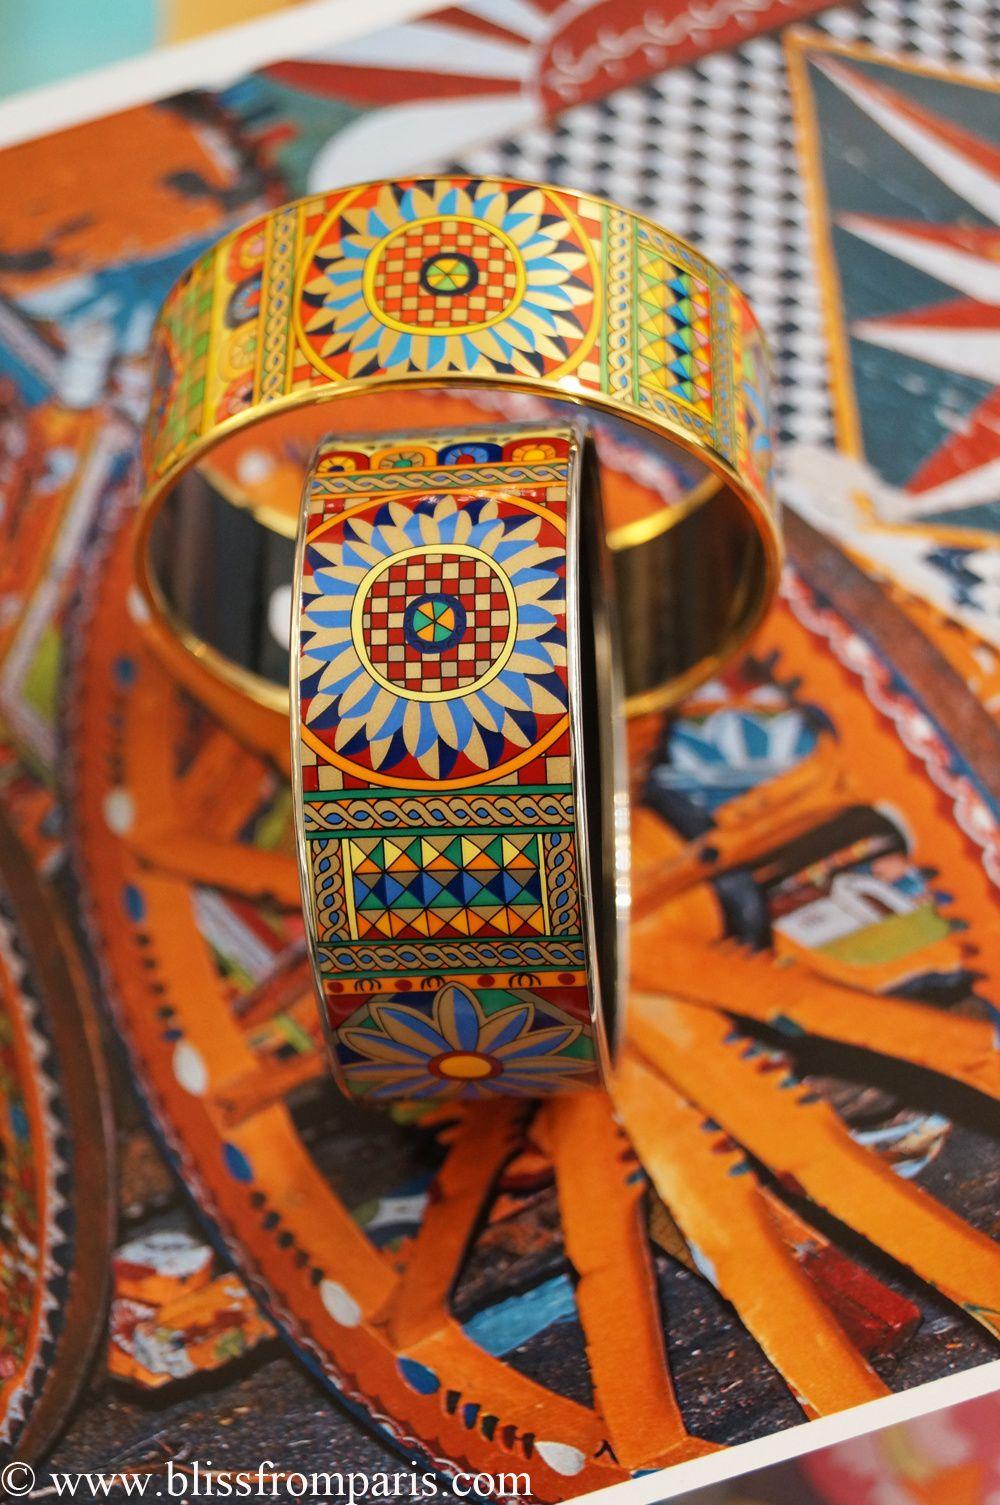 Pin By Catalea Bianco On Need Money Hand Painted Jewelry Enamel Jewelry Dolce Vita